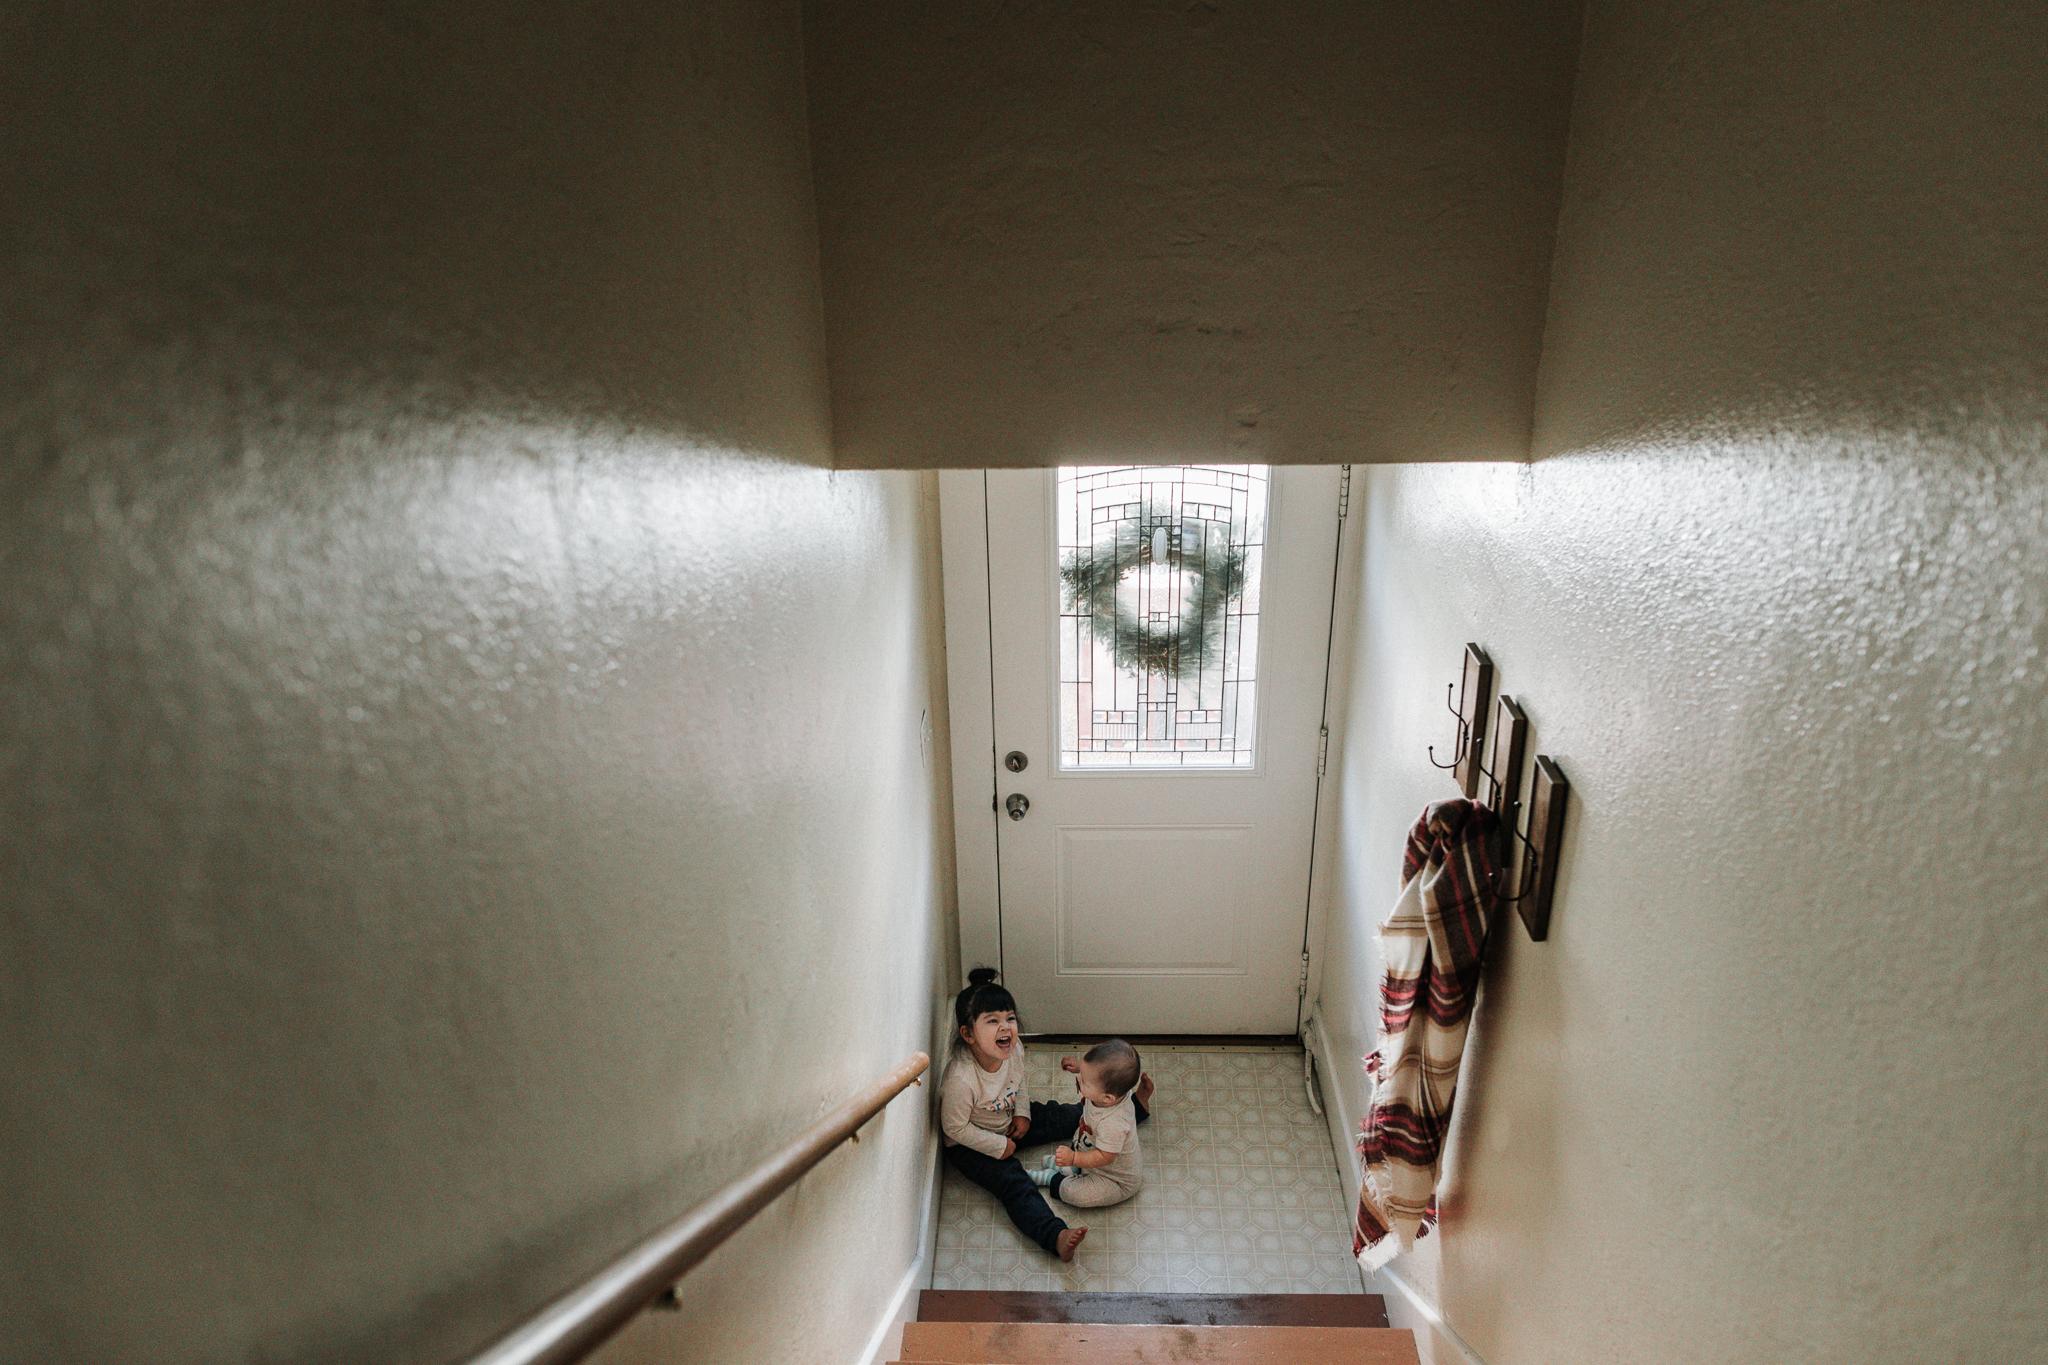 Arlene Easterwood Photography SF Bay Area Family Lifestyle Photographer